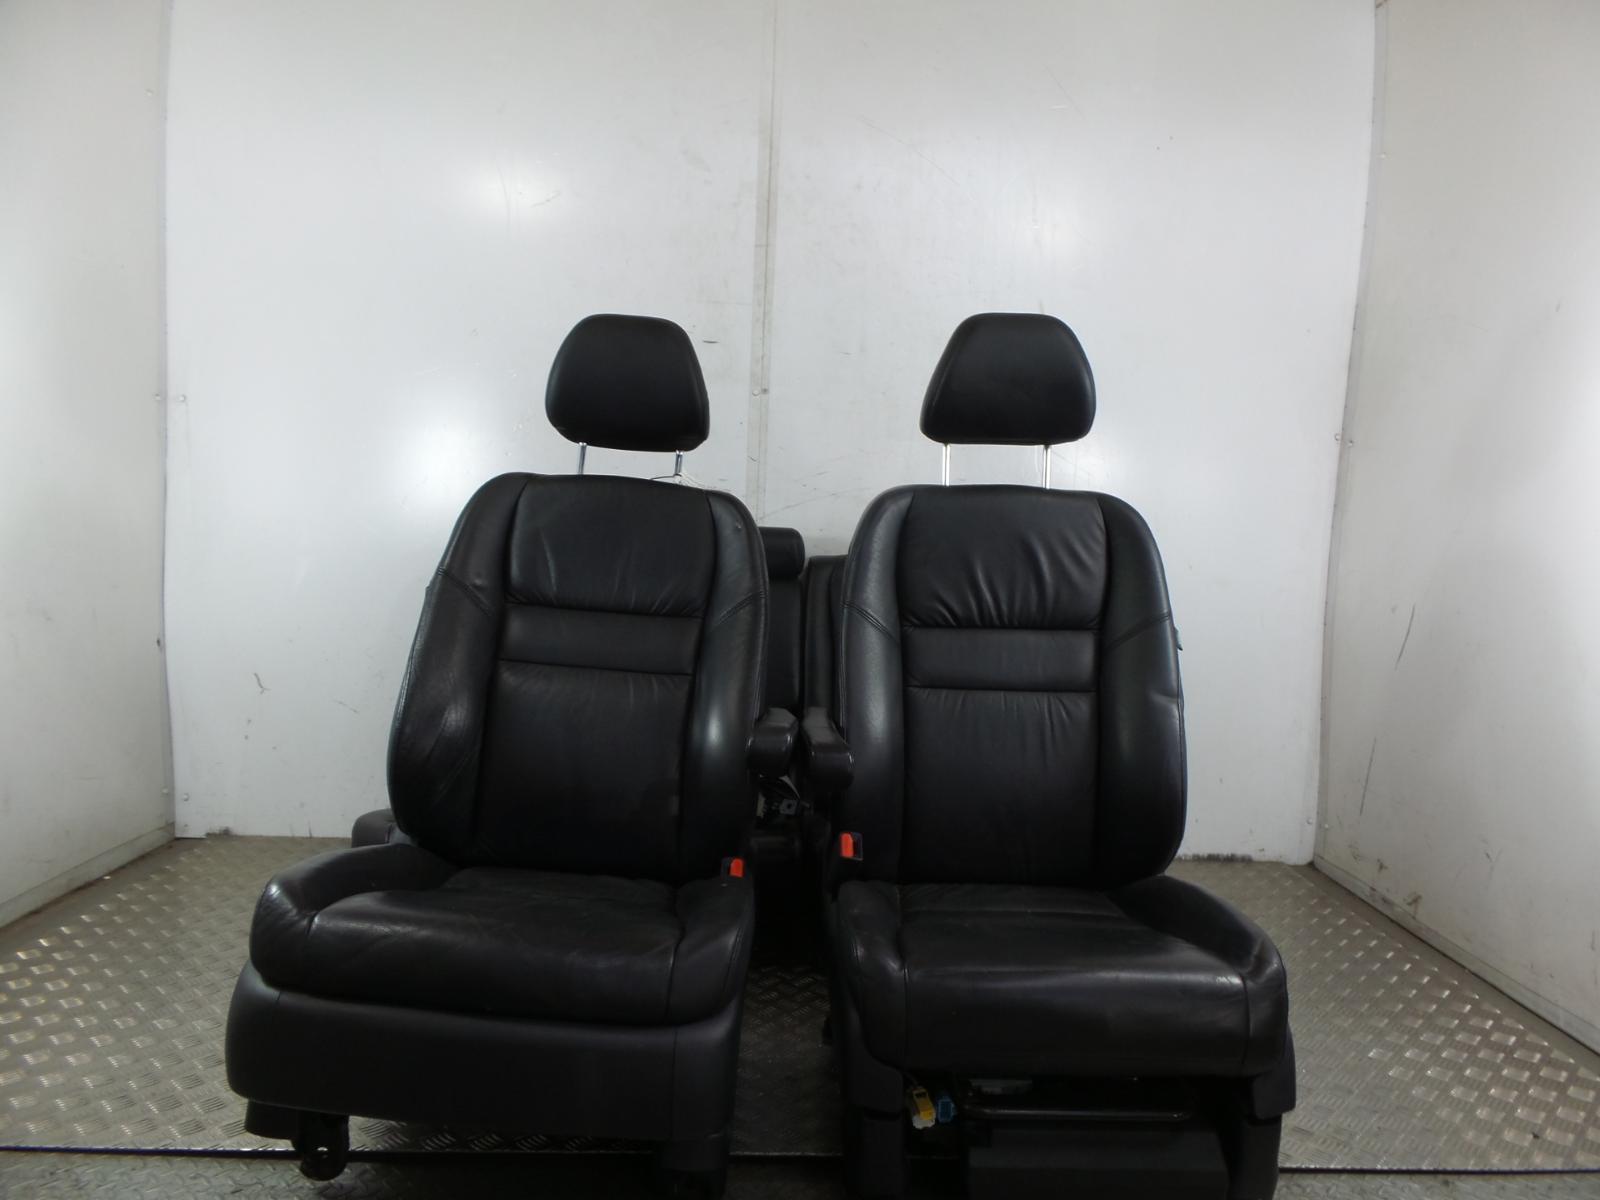 2007 Honda Crv 2007 2012 Black Leather Seats Interior Front Rear Ebay